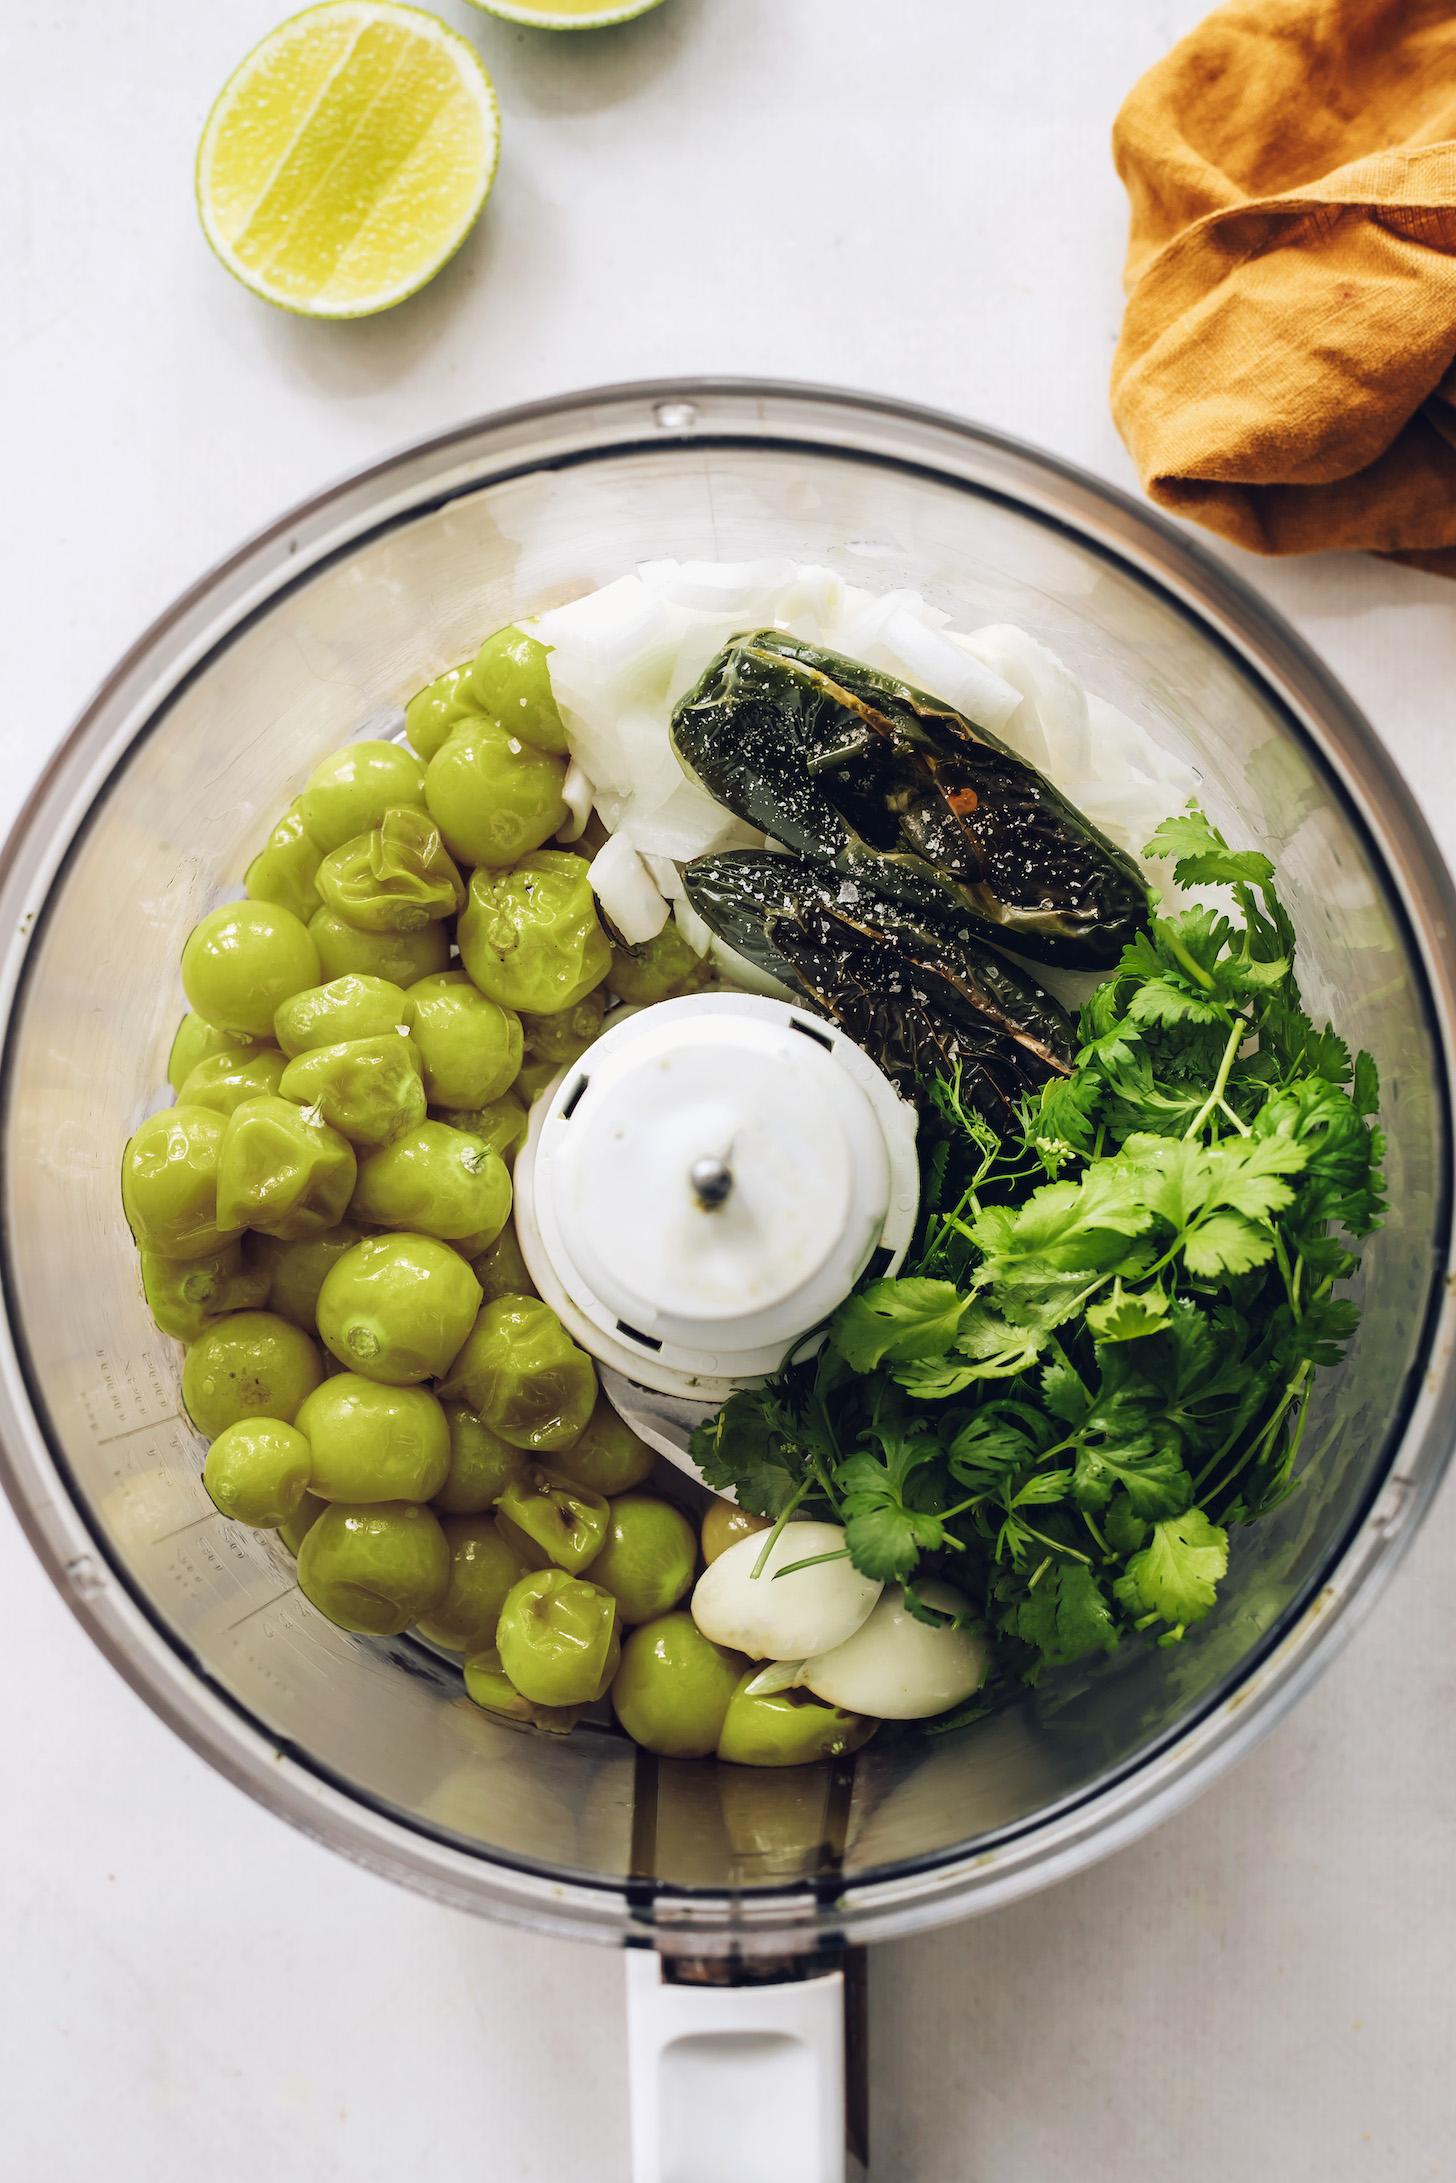 Food processor with roasted tomatillos and jalapeños, cilantro, garlic, onion, and salt